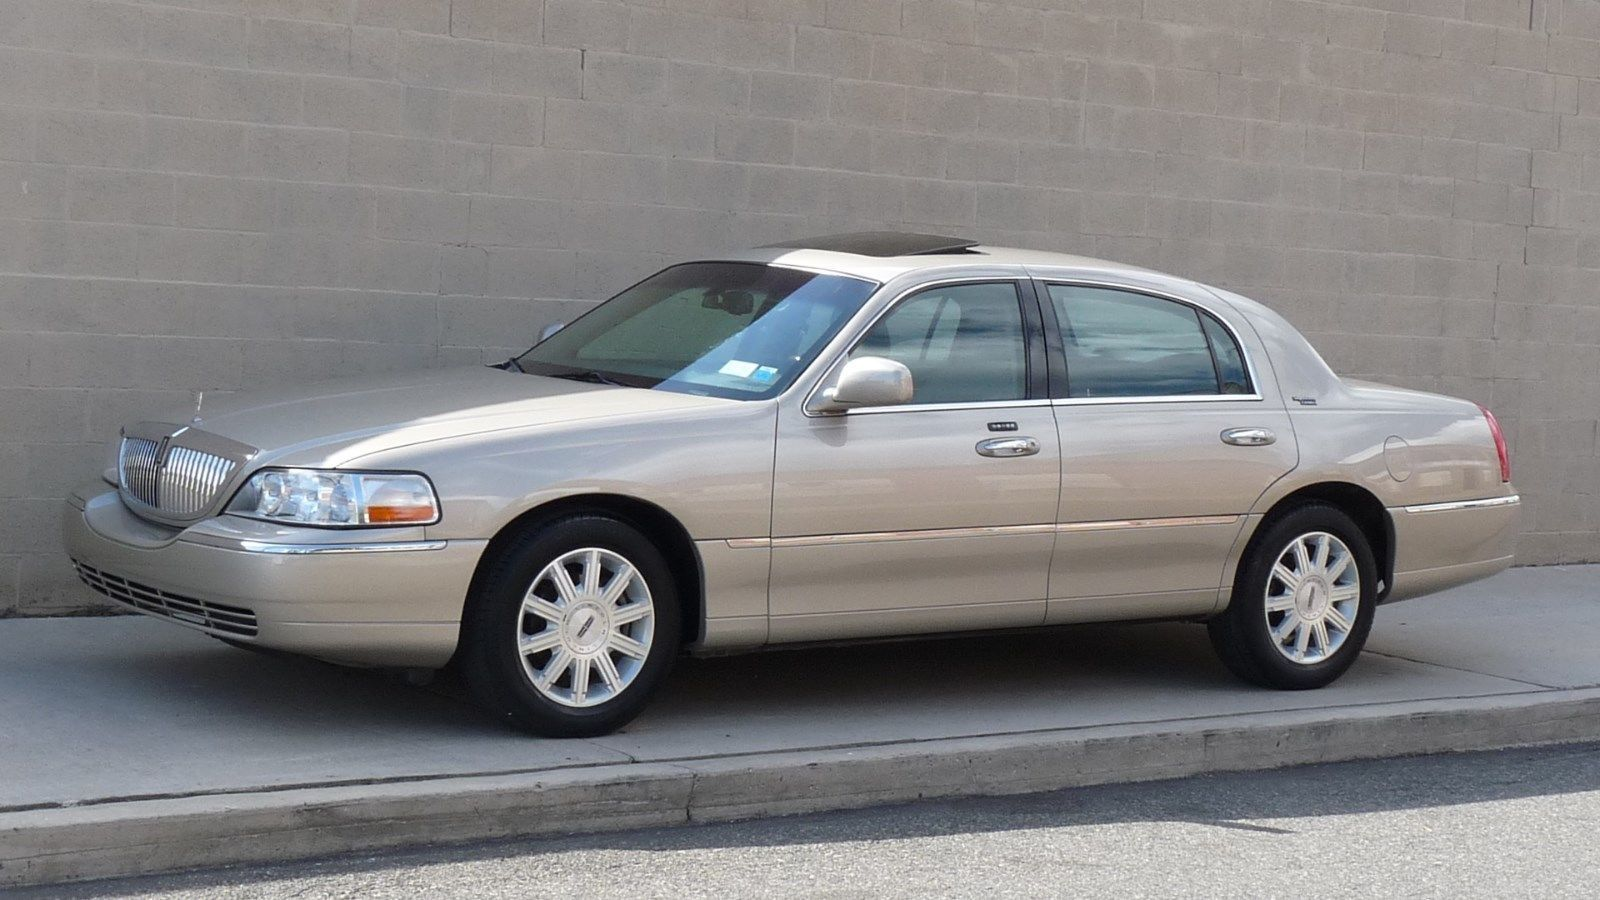 2006 Lincoln Town Car Signature Limited Sedan 4 Door Luxury Auto